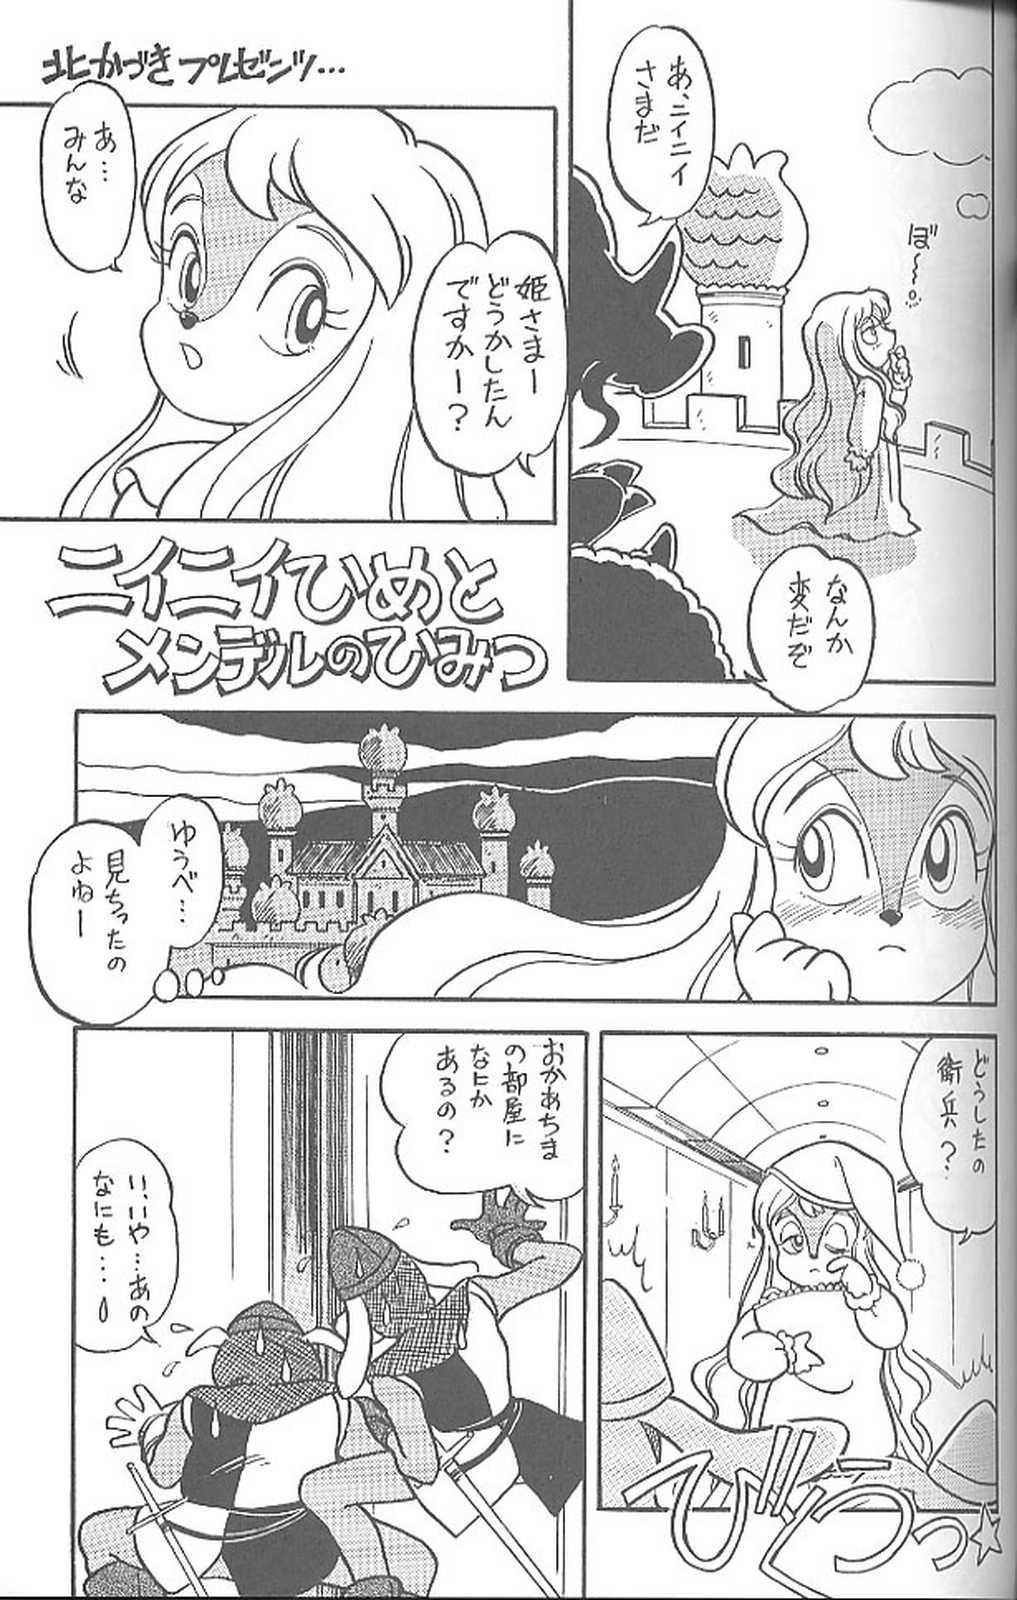 Haraharatokei vol.4 29